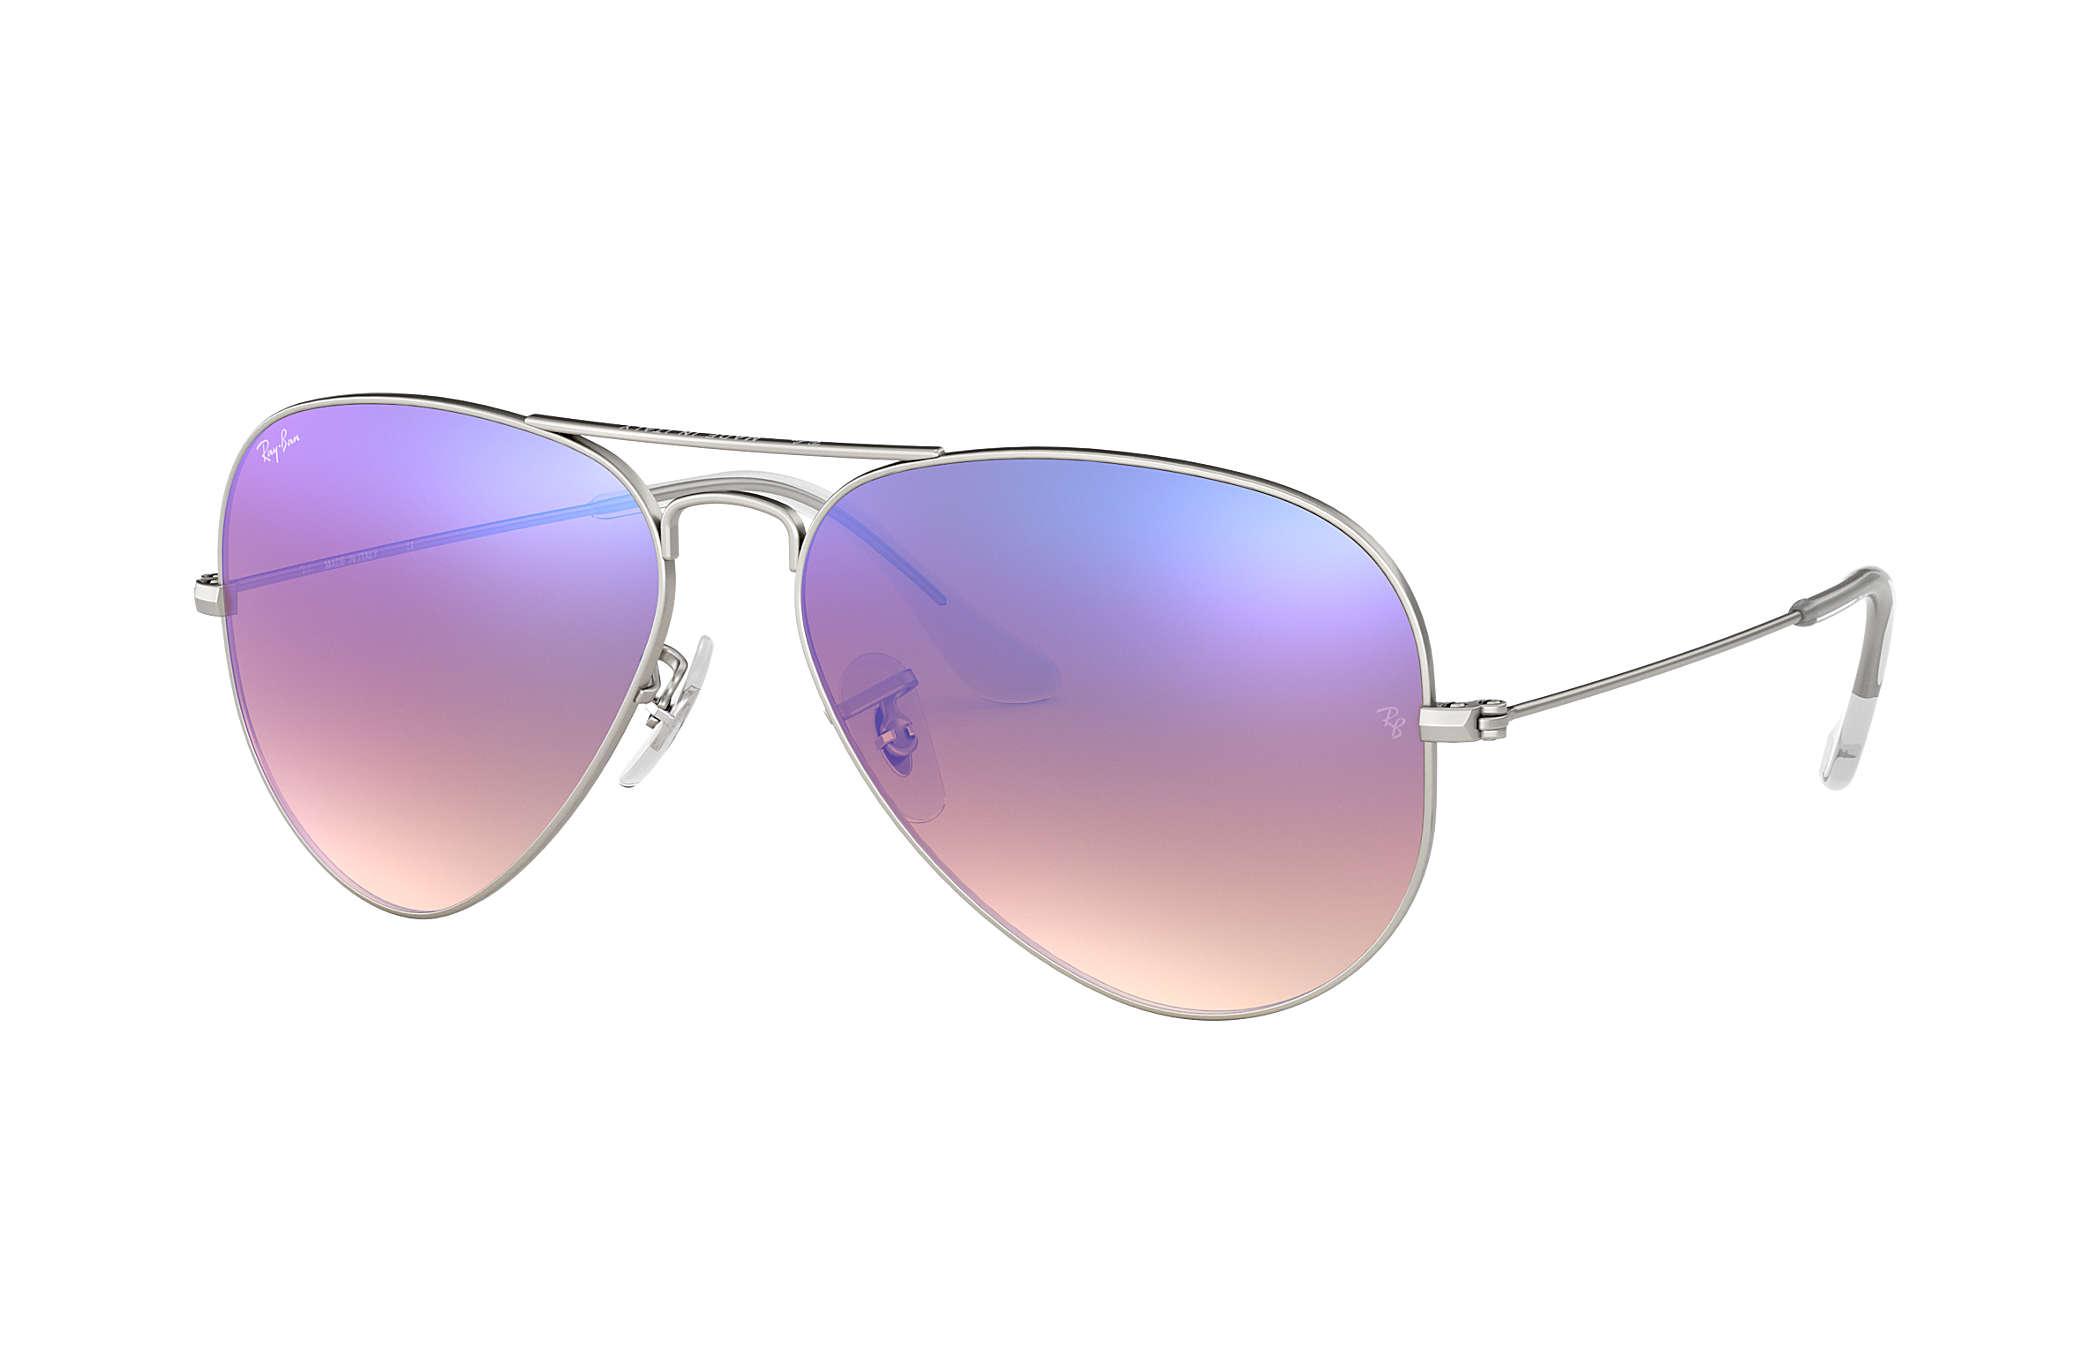 Ray ban sunglasses gradient - Ray Ban 0rb3025 Aviator Flash Lenses Gradient Silver Sun